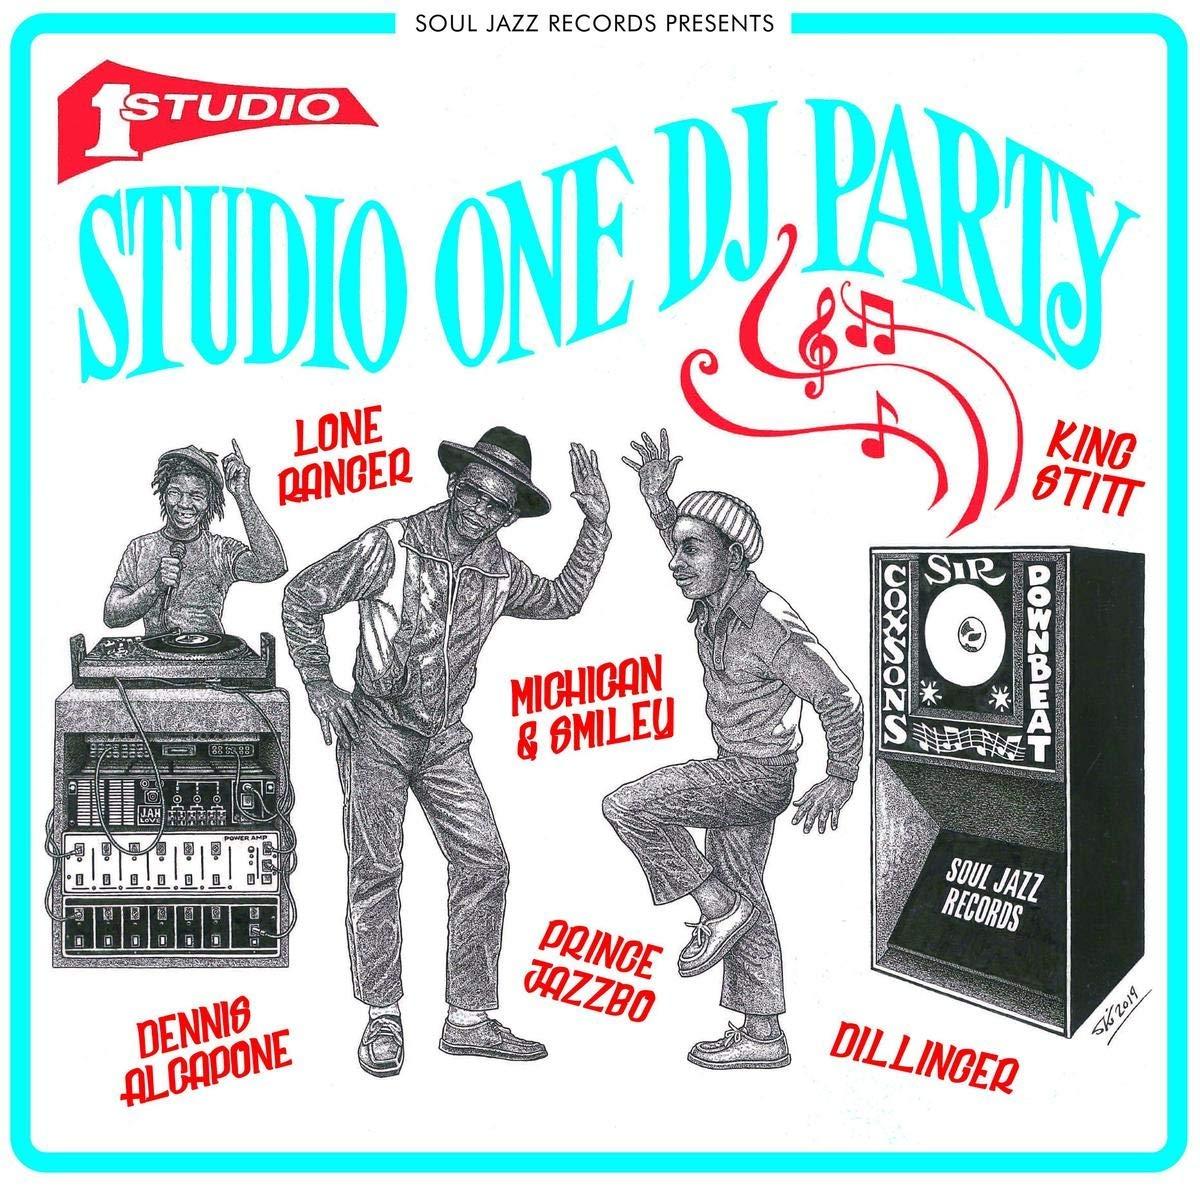 Soul Jazz Records presents STUDIO ONE DJ Party by Soul Jazz